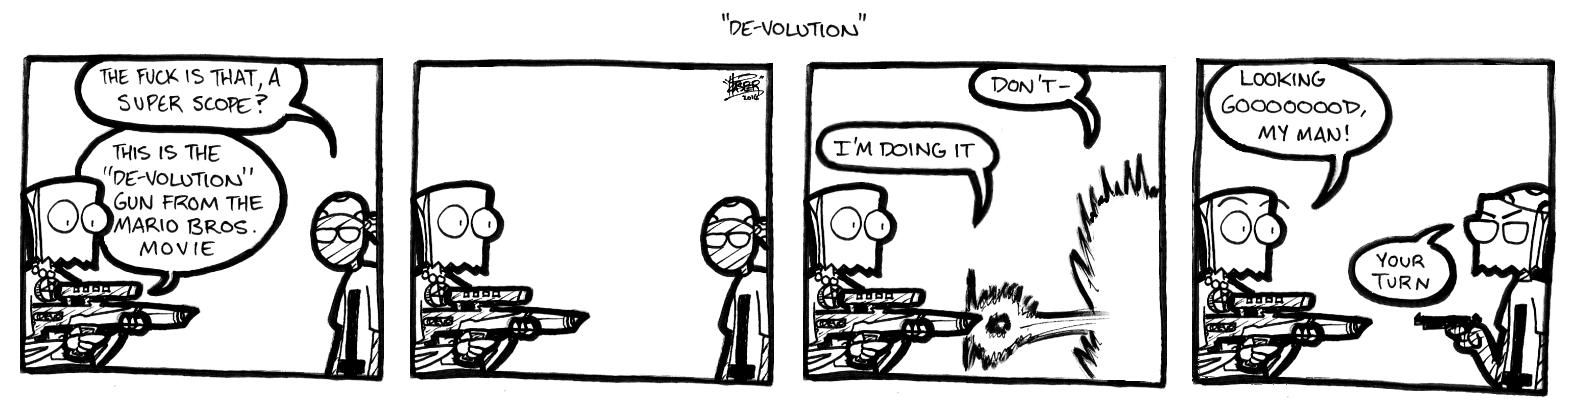 De-volution